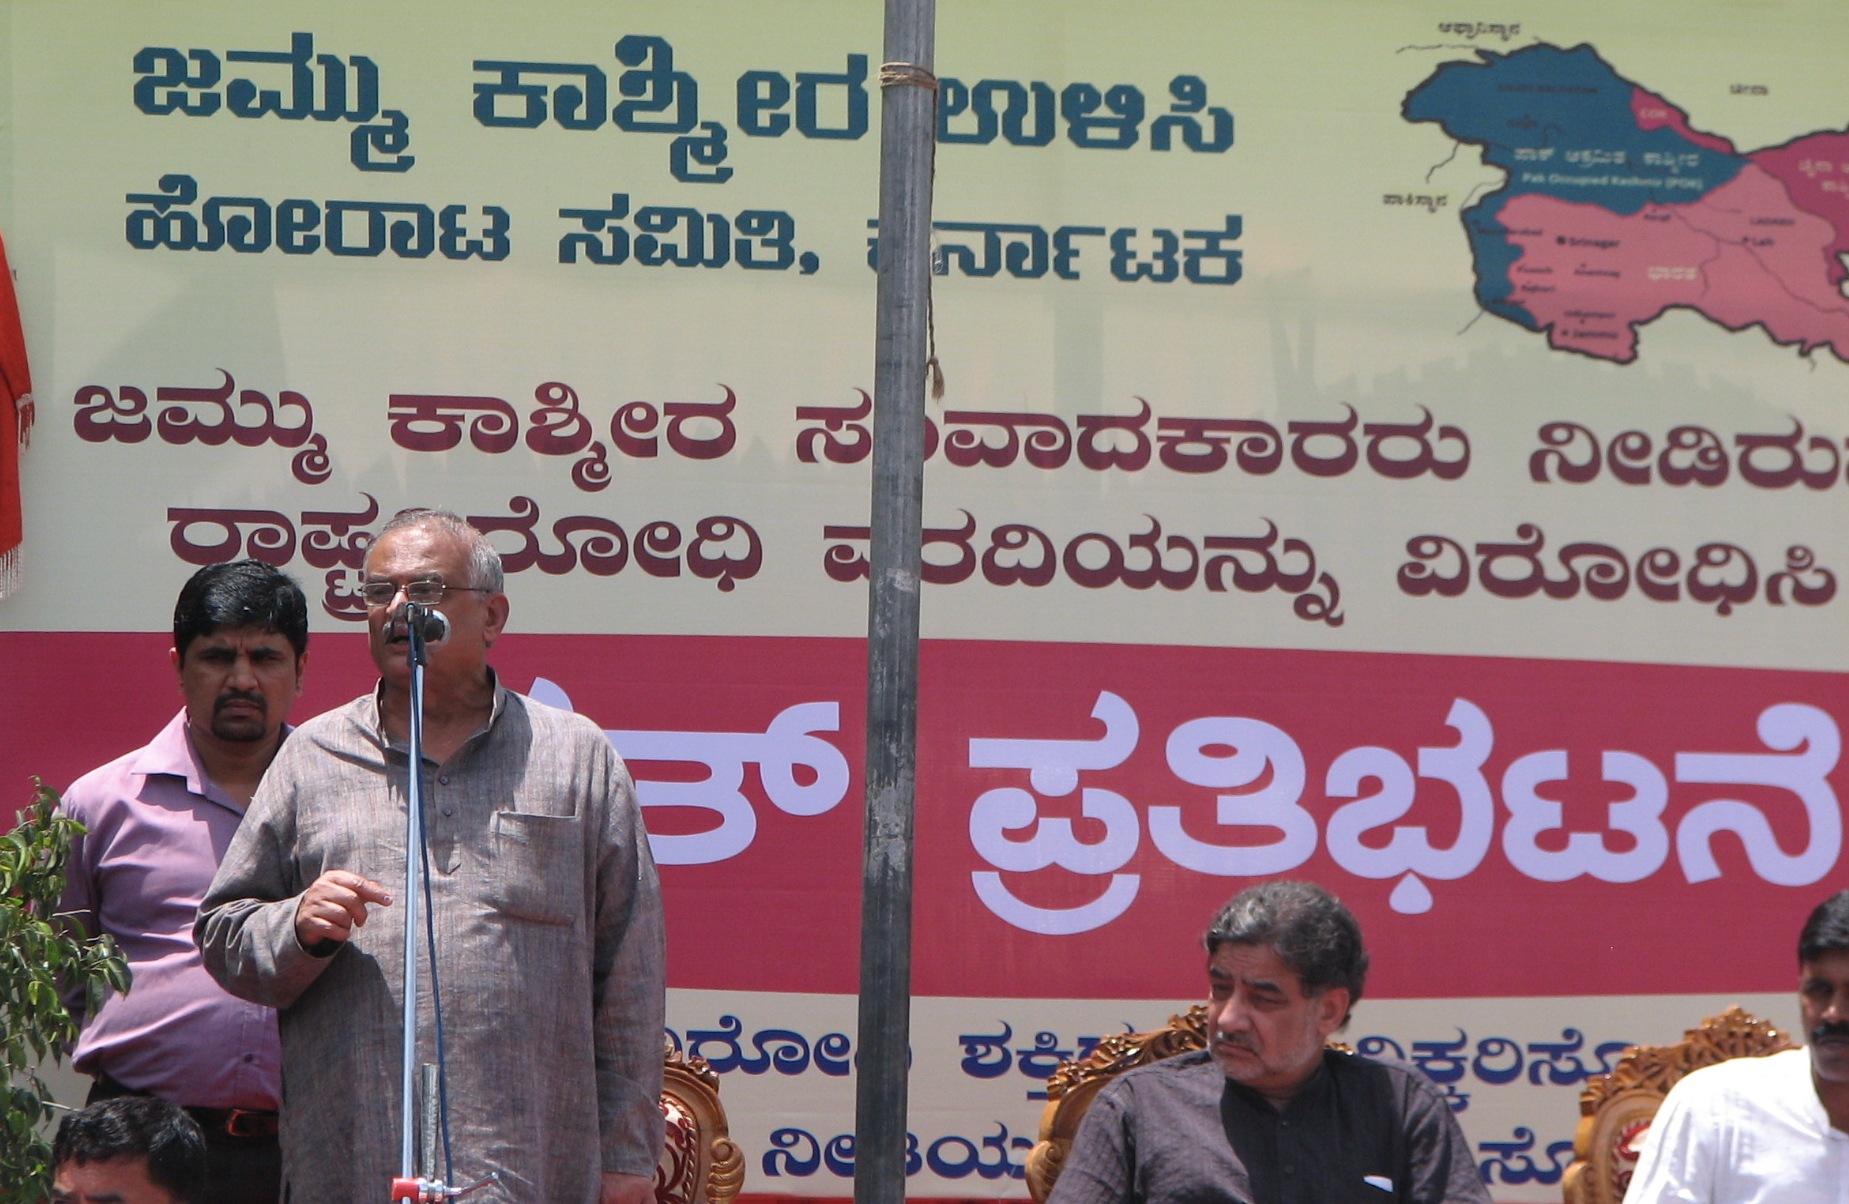 'JK Interlocutor report is anti-national': RSS leader V Nagaraj at Bangalore